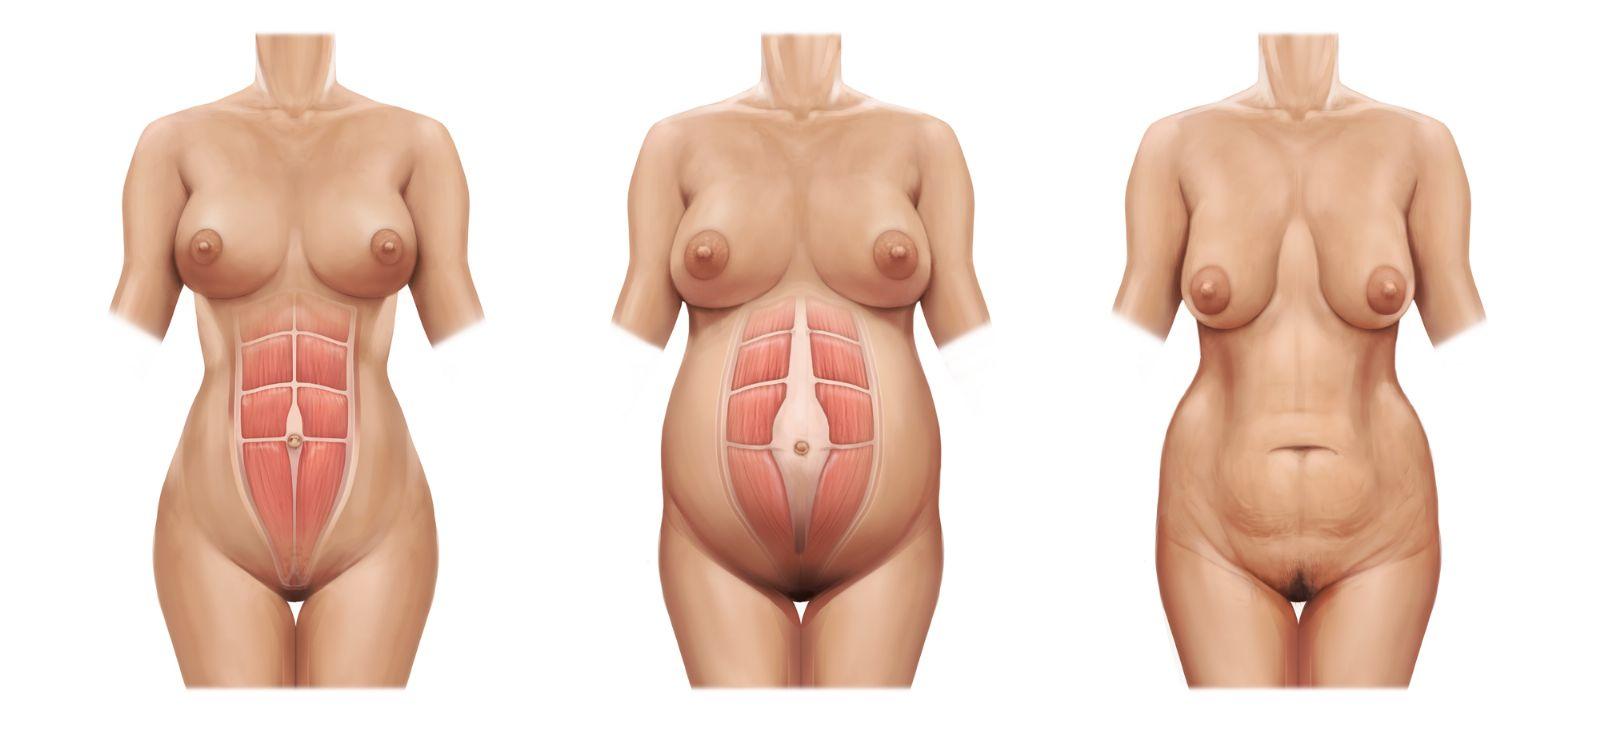 Resultado de imagen de barriga postparto dibujo